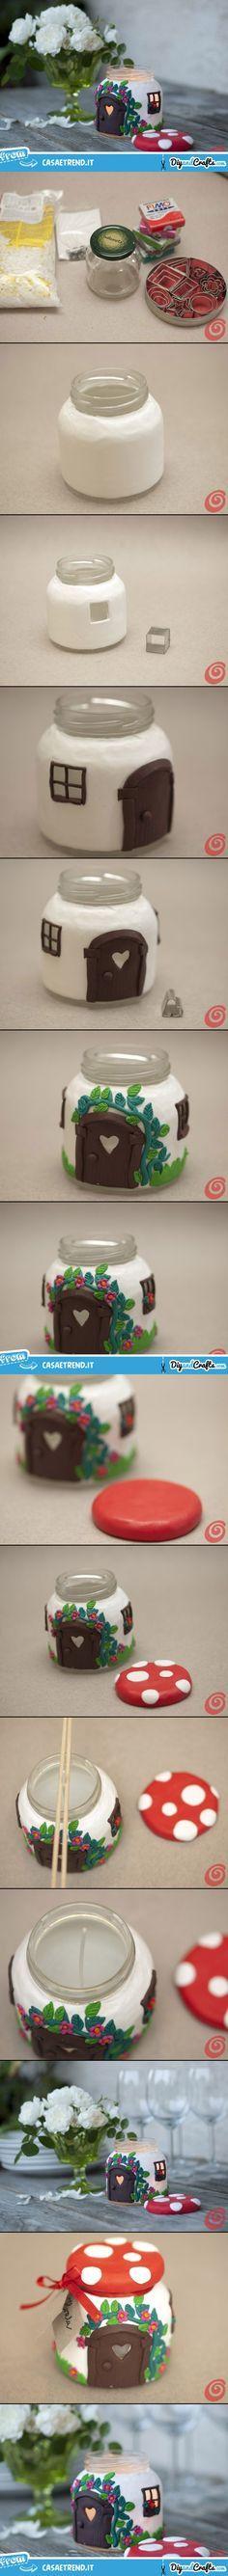 Glass Jar Mushroom – candle House   #DIY --- maybe make the jar & use an electric tea candle